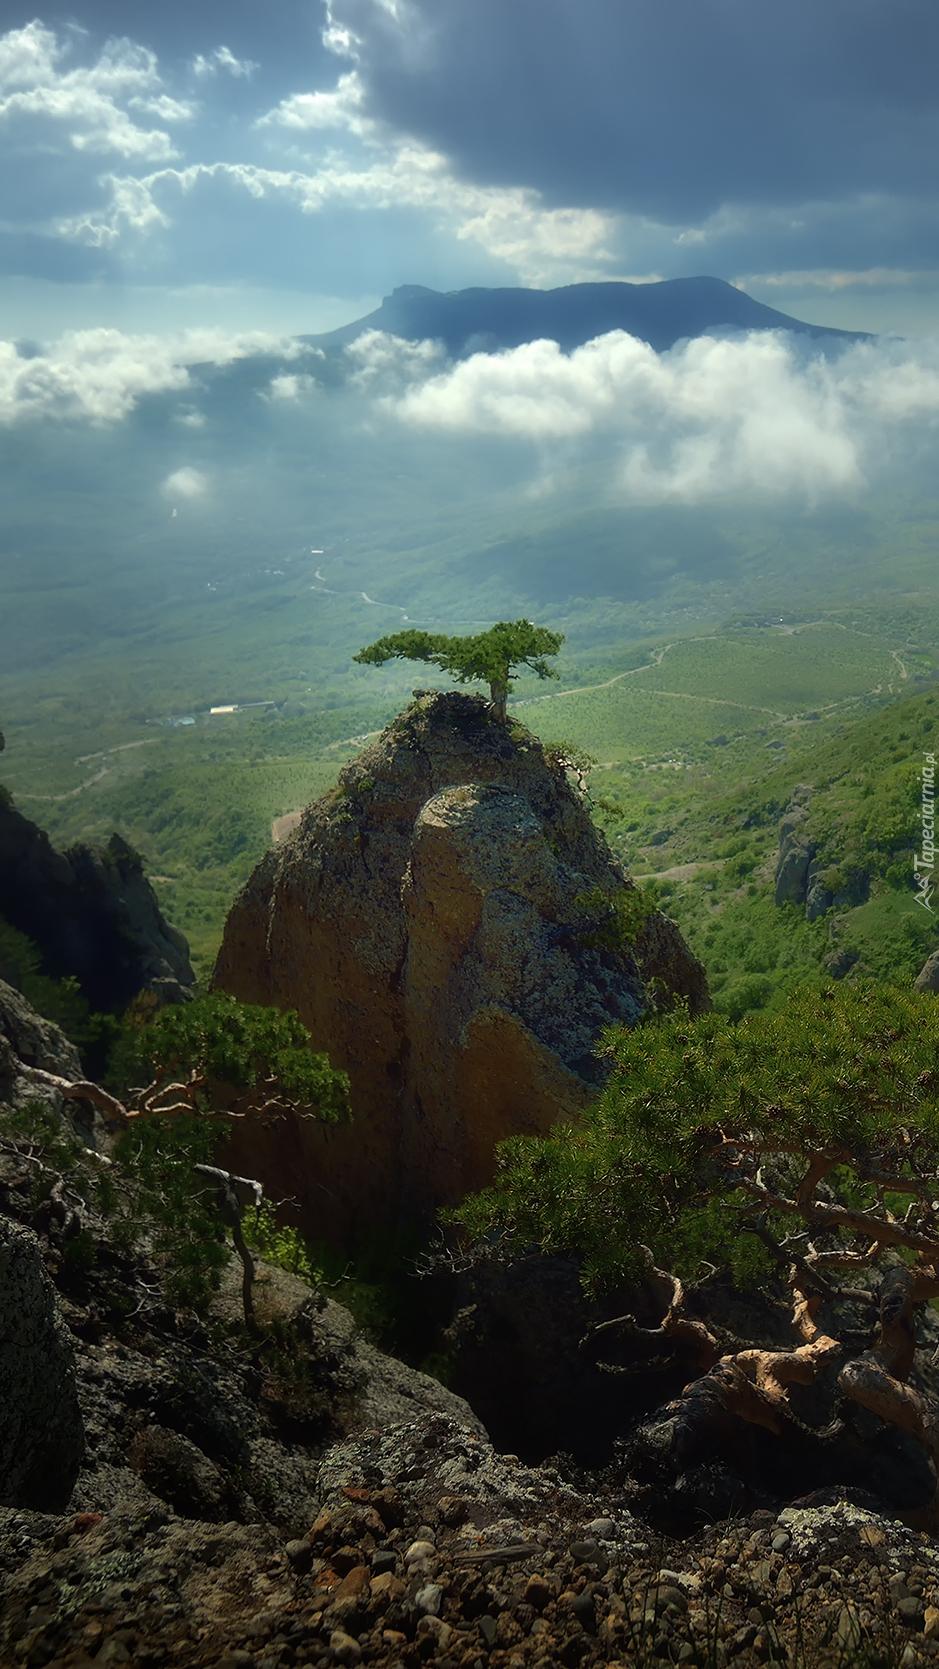 Sosna na skale w górach Krymskich